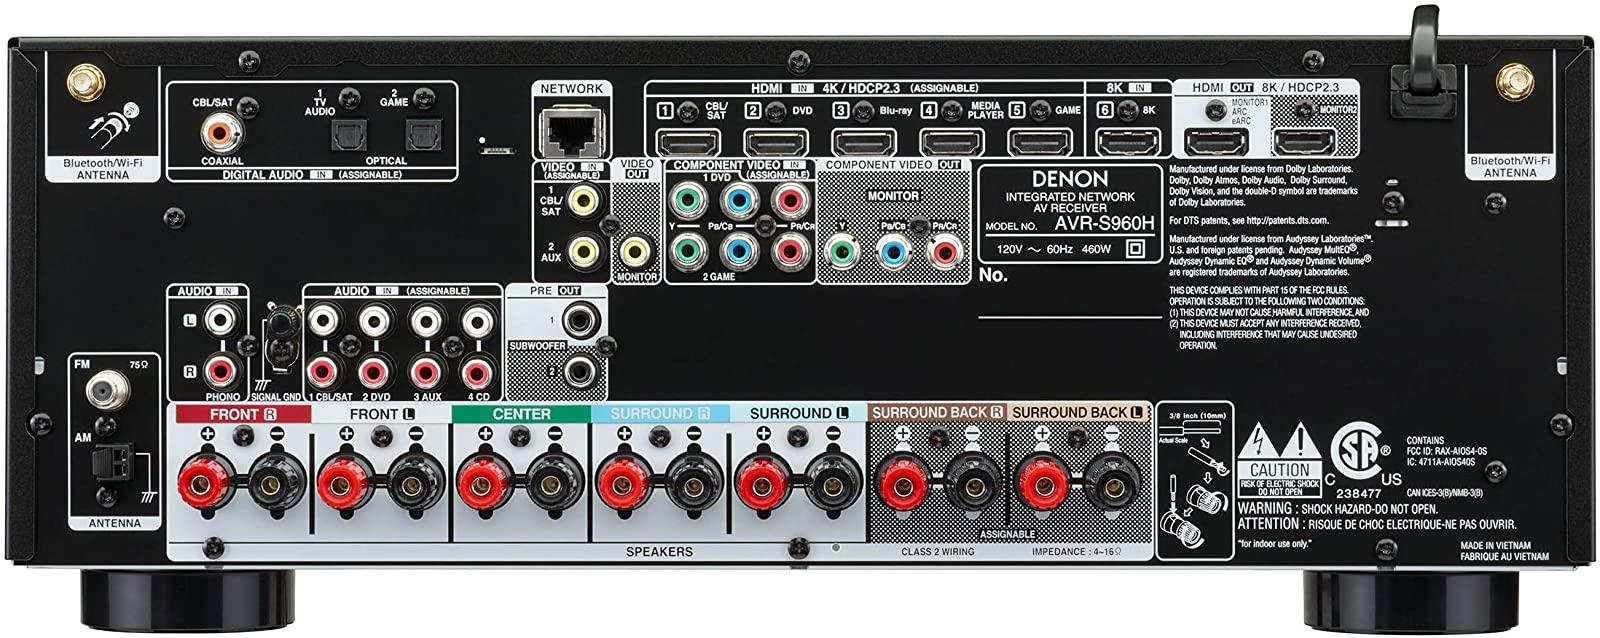 panel trasero s960h